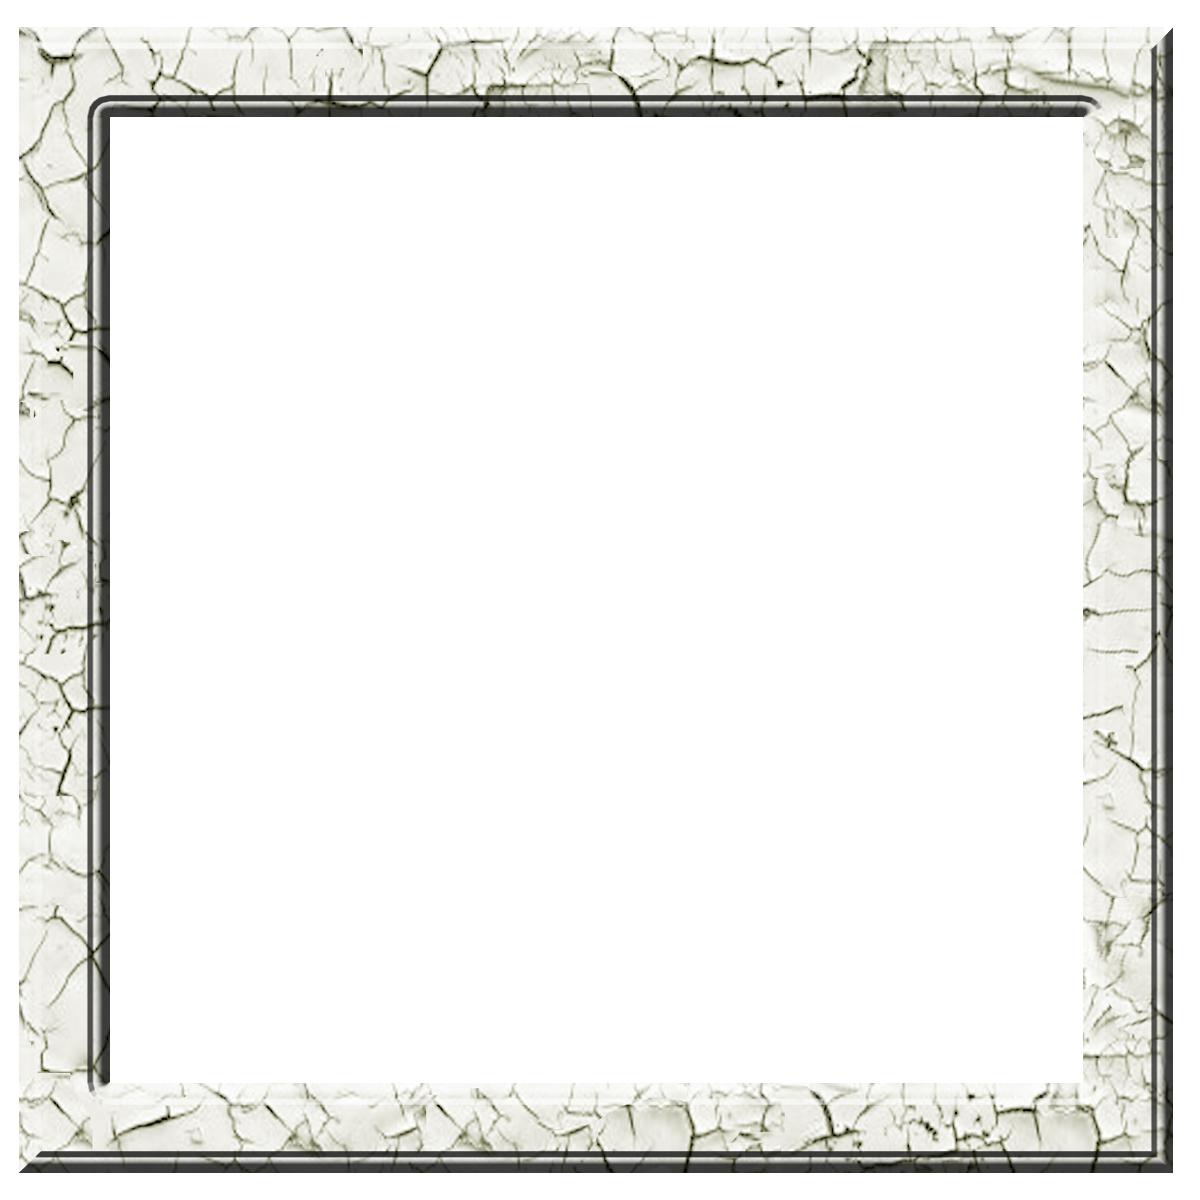 square frame png image 25175